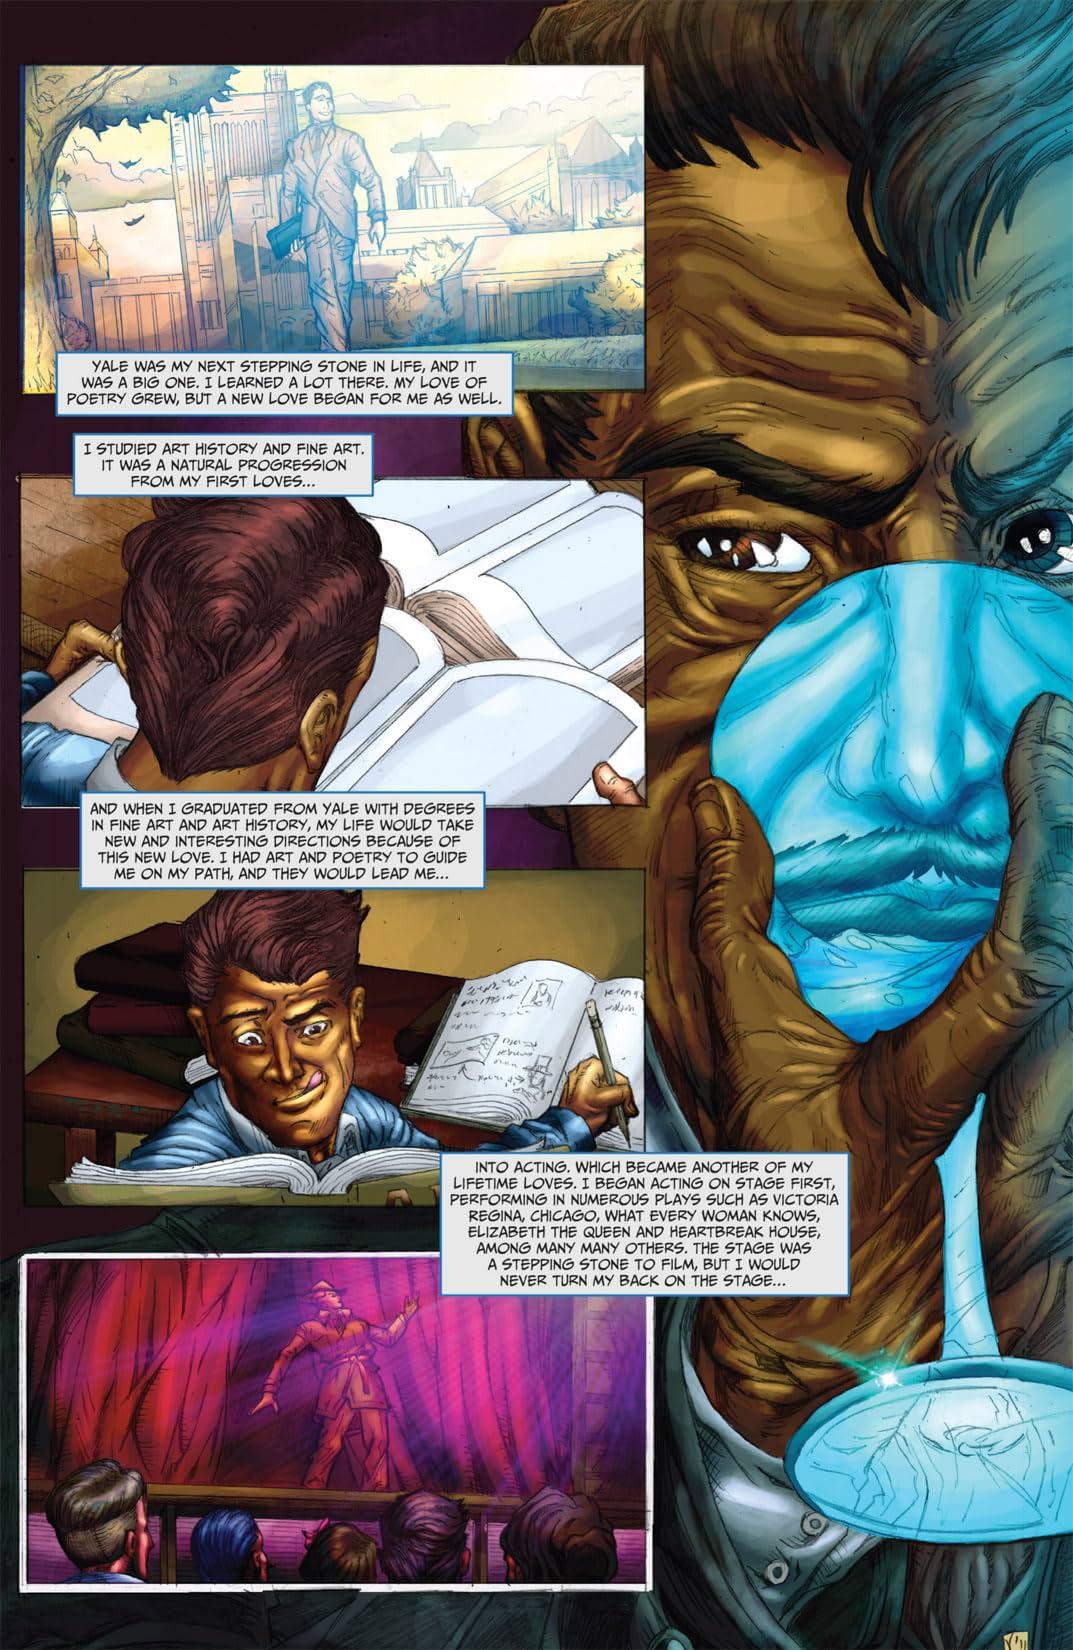 Vincent Price: Biography